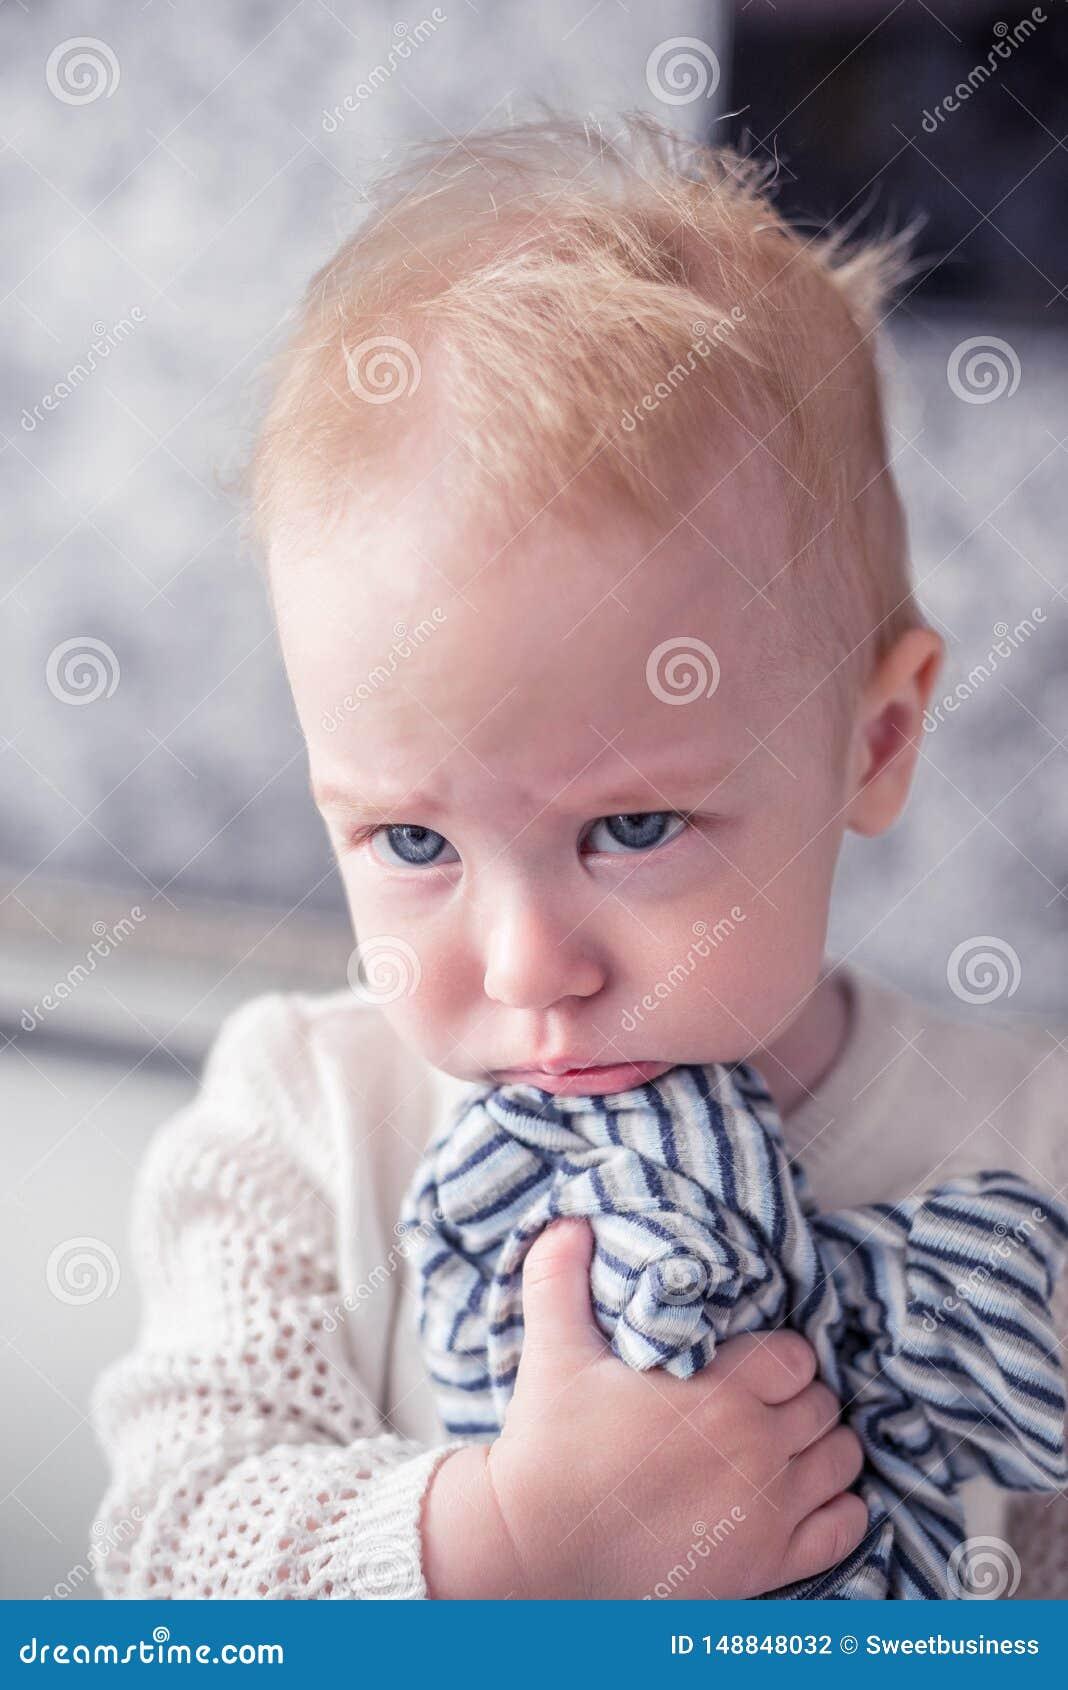 Sad Baby Girl Looking Aside Close Up Stock Photo - Image ...